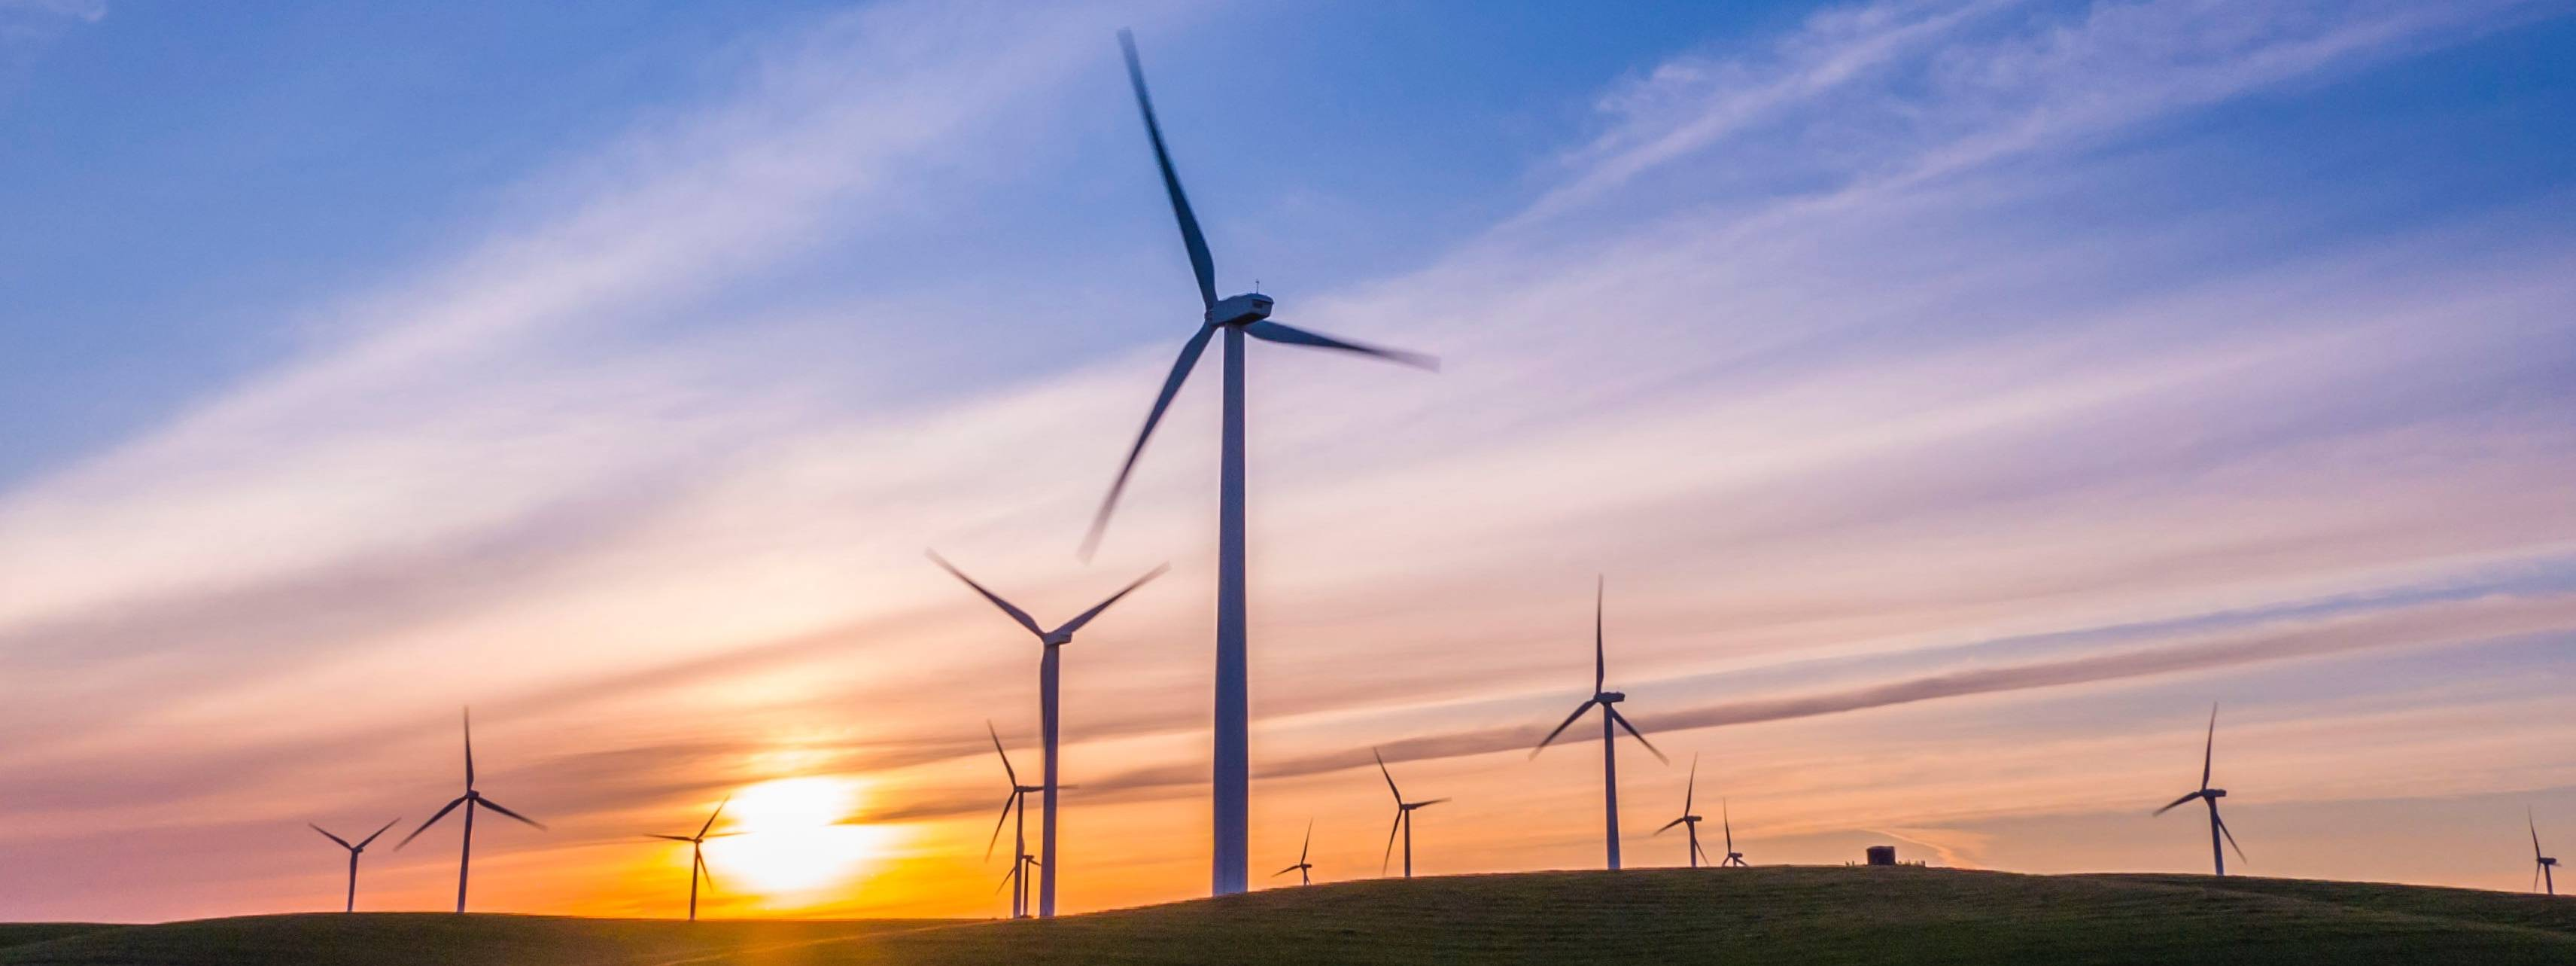 WRISE celebrates National Clean Energy Week